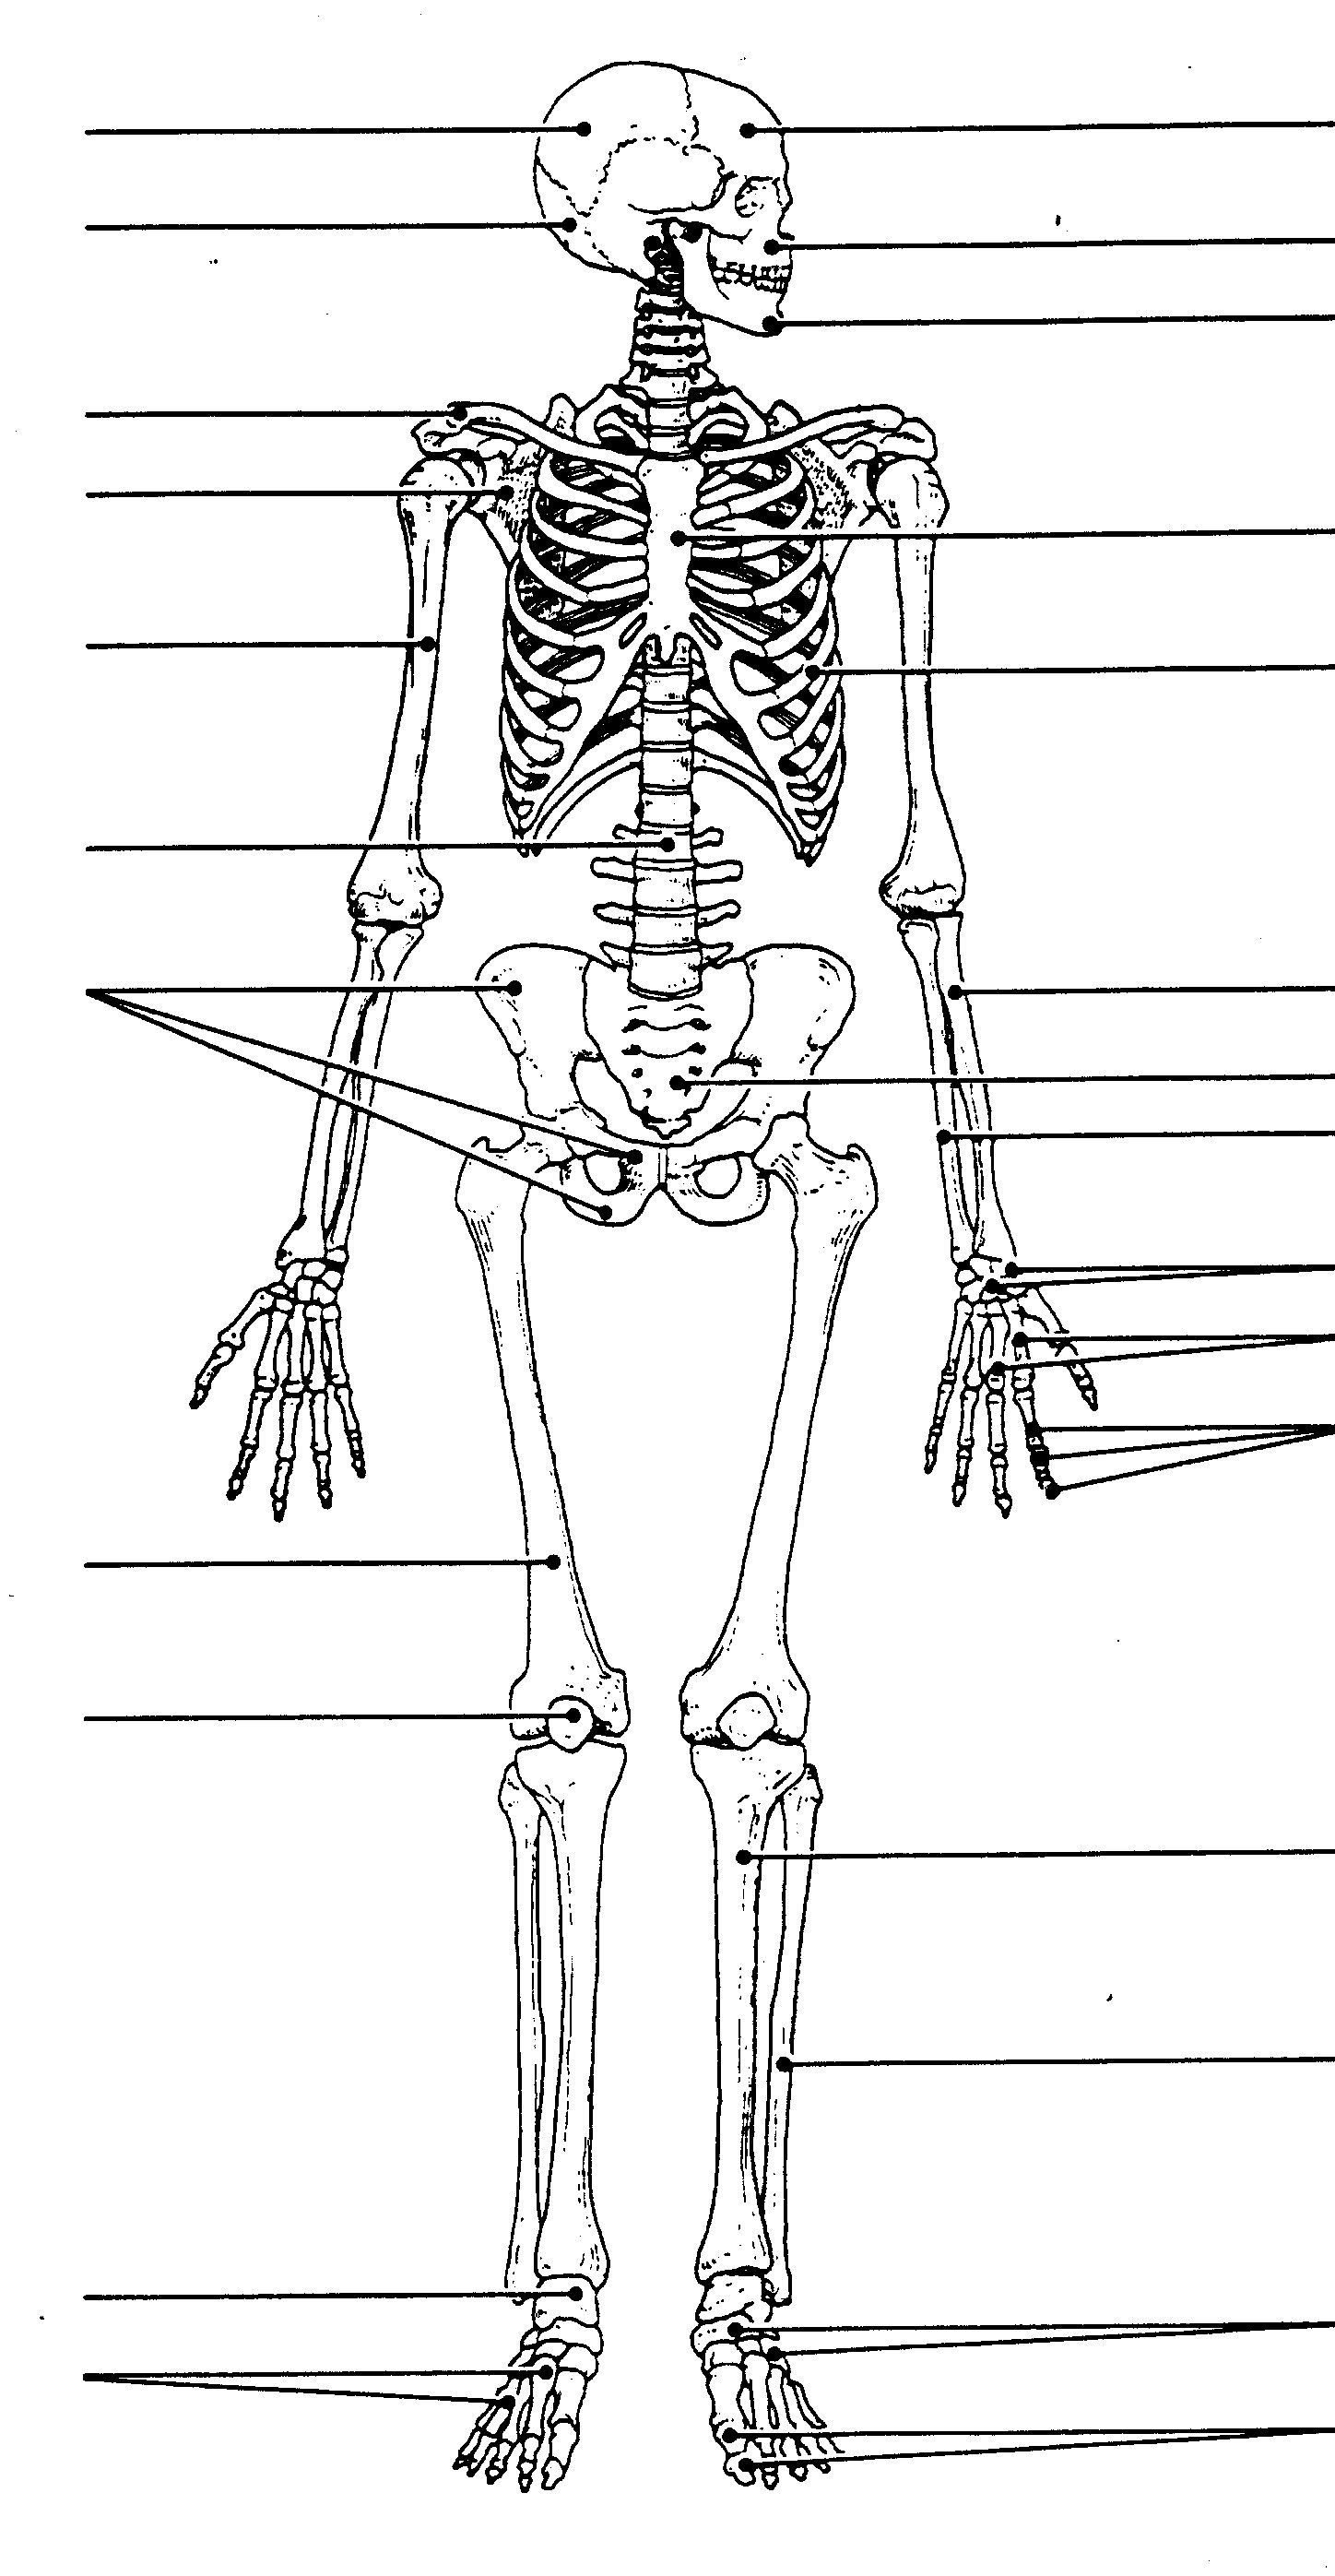 hight resolution of body skeleton diagram blank blog wiring diagram bones body diagram unlabeled